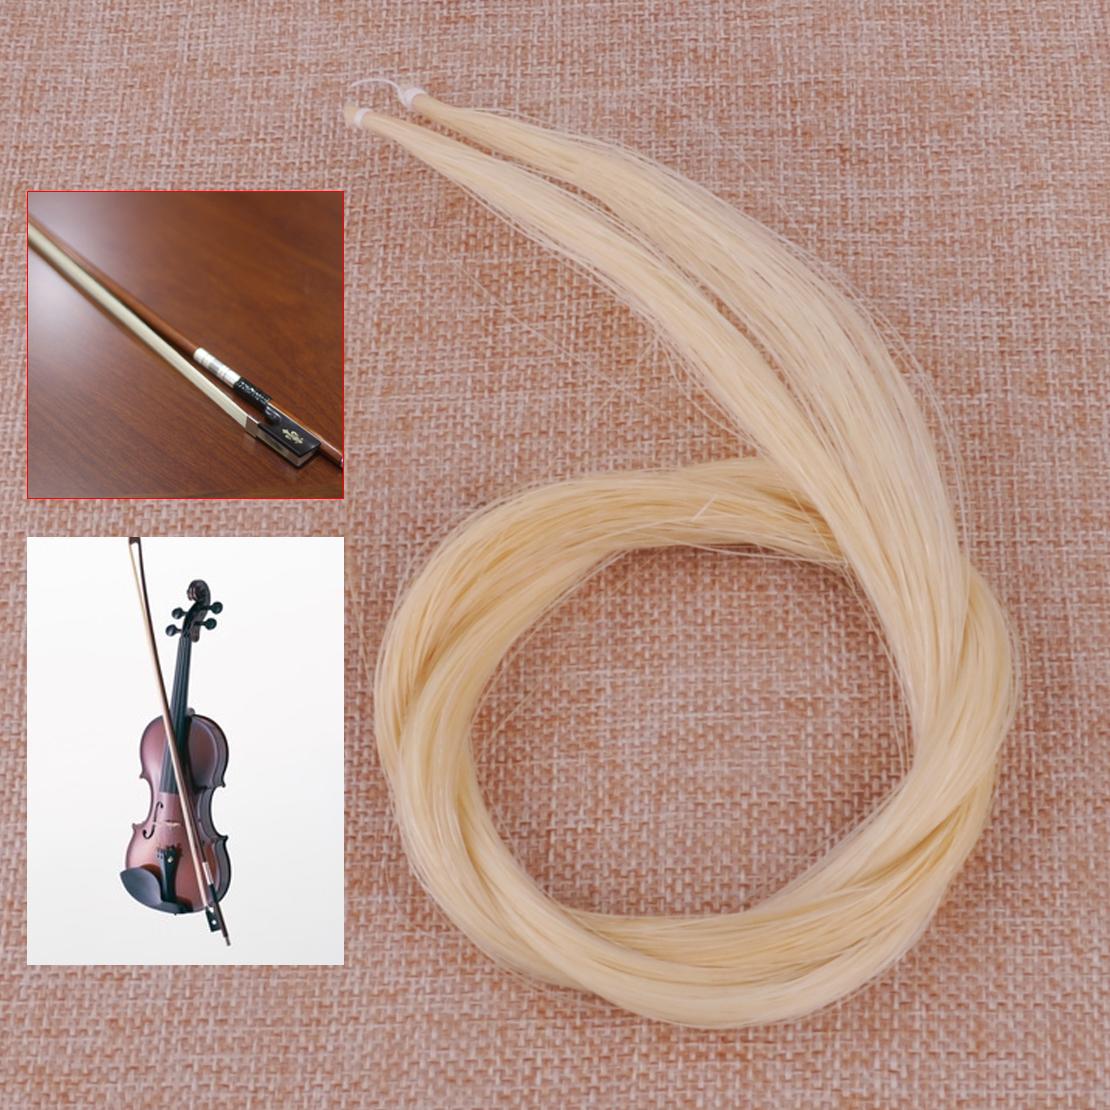 4//4 Arbor Violin Bow Geige Bogen Rosshaar Exquisite Violine Mithelfer CN